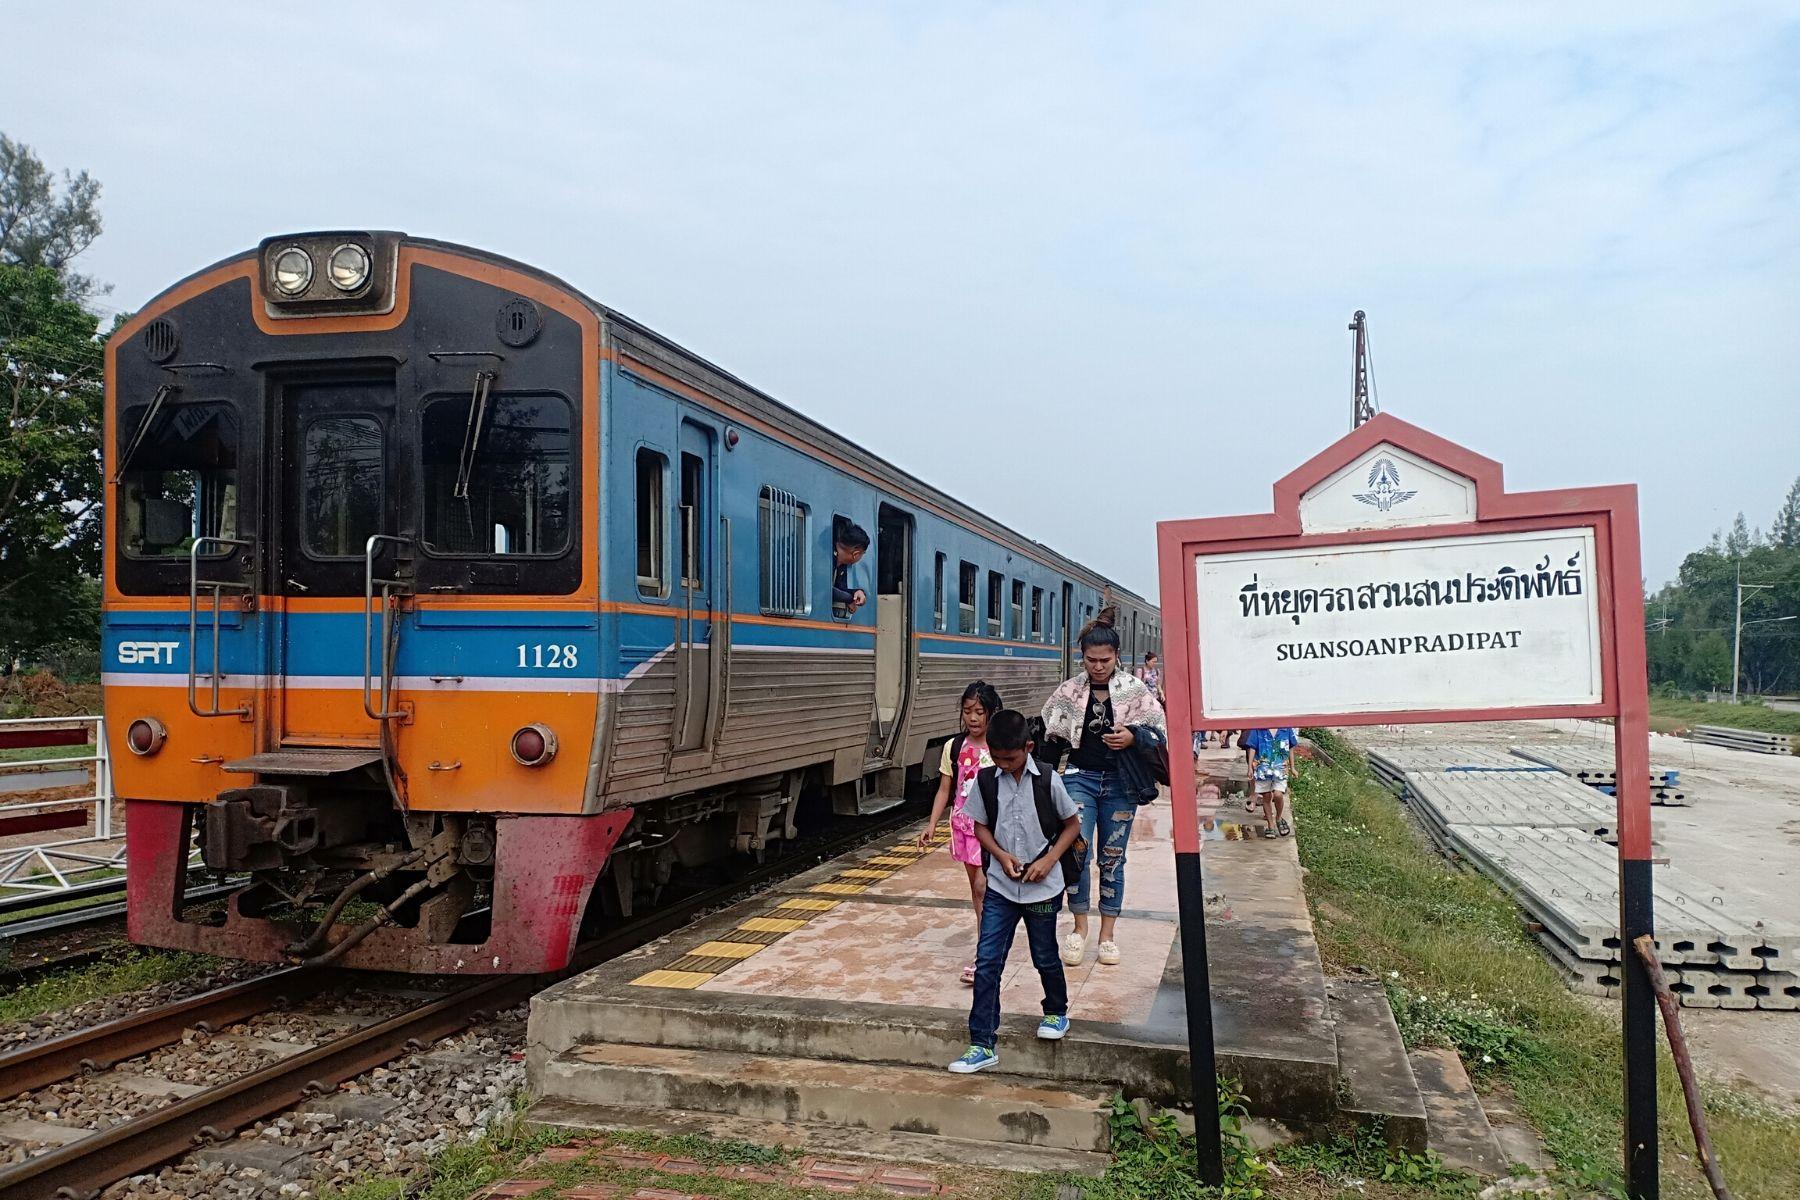 HappyFresh_One_Day_Trip_Near_Bangkok_Suan_Son_Pradipat_Train